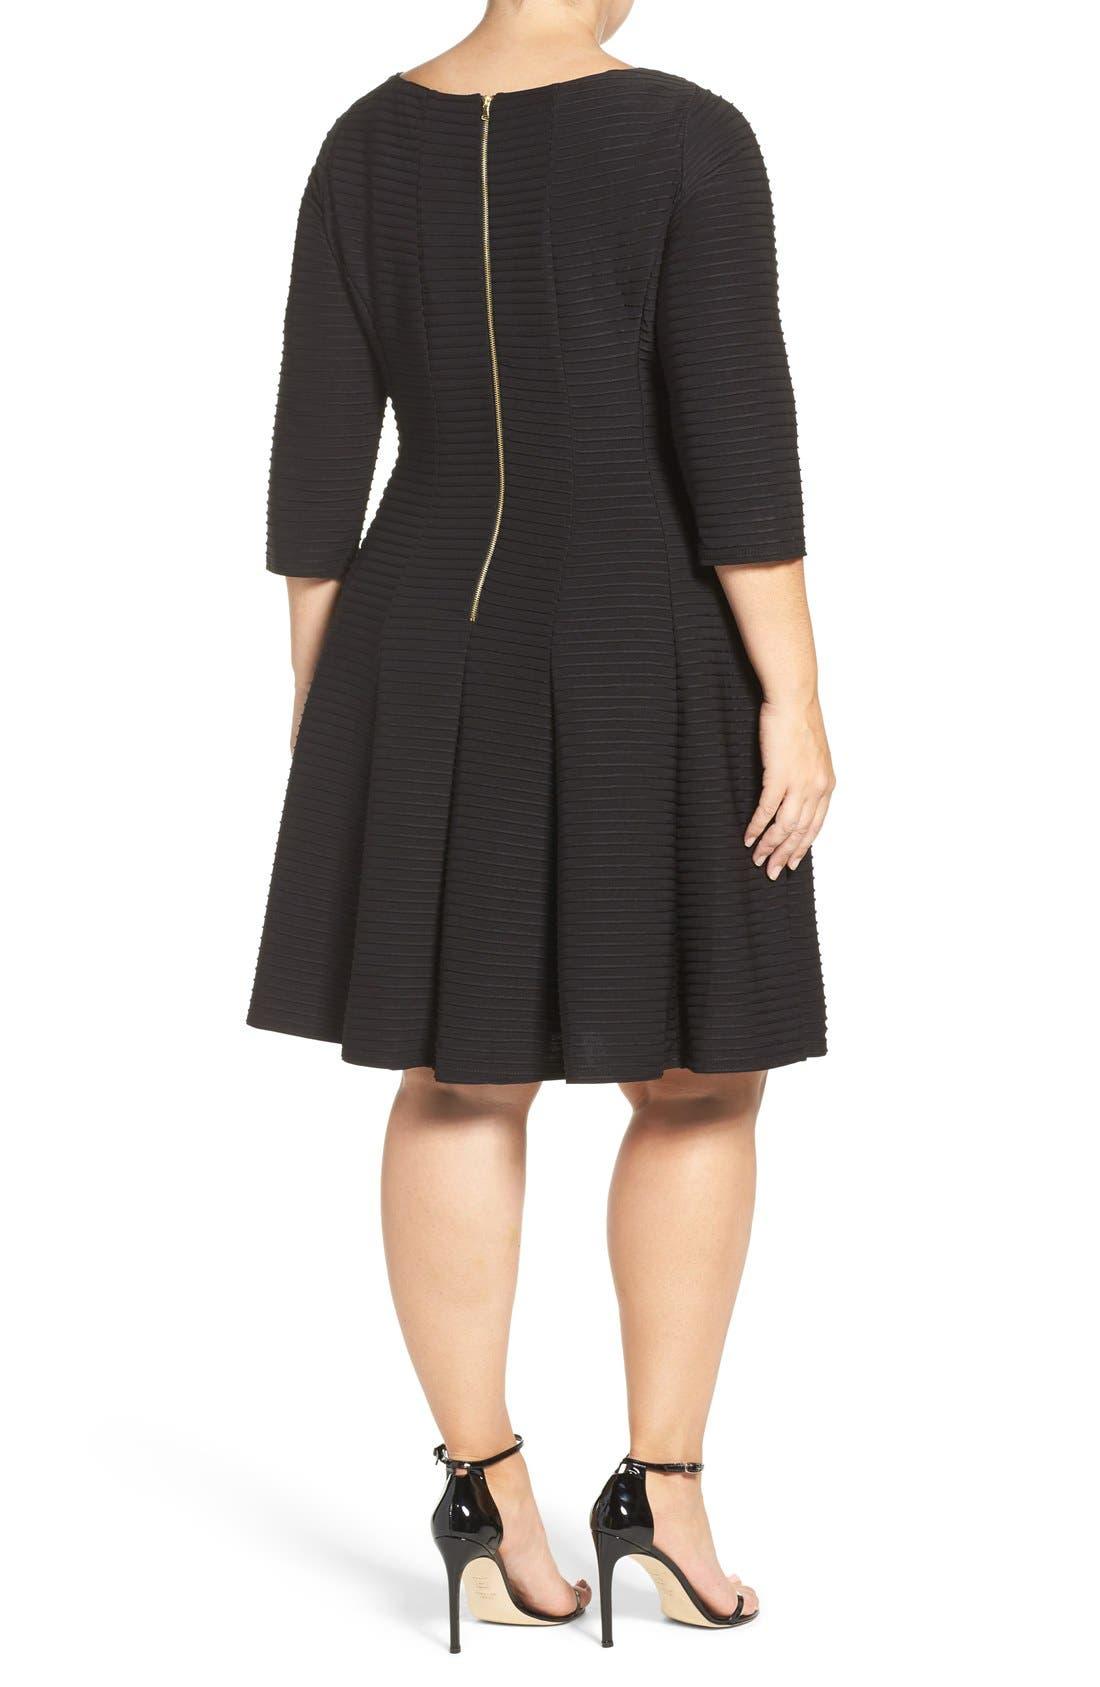 Alternate Image 2  - Gabby Skye Pintuck Knit Fit & Flare Dress (Plus Size)